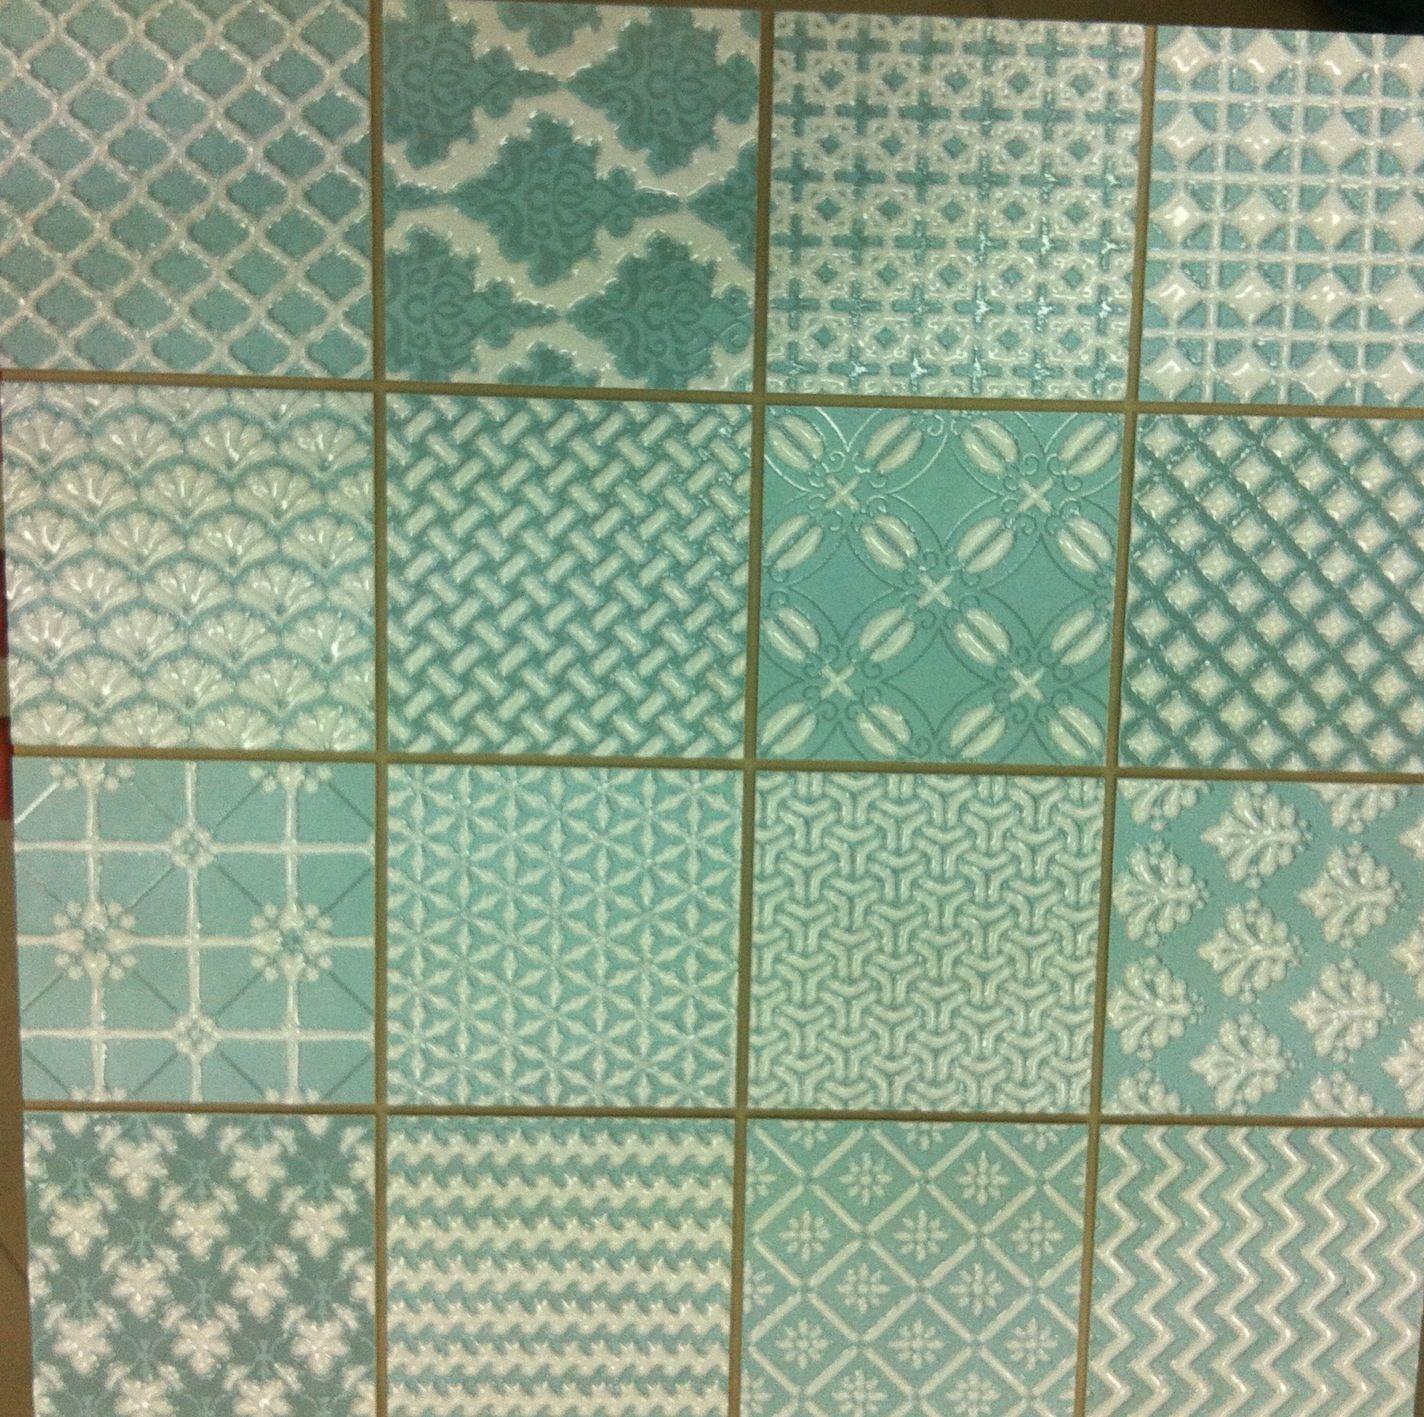 Duck Egg Green Kitchen Tiles: Love This Tile As A Kitchen Splashback